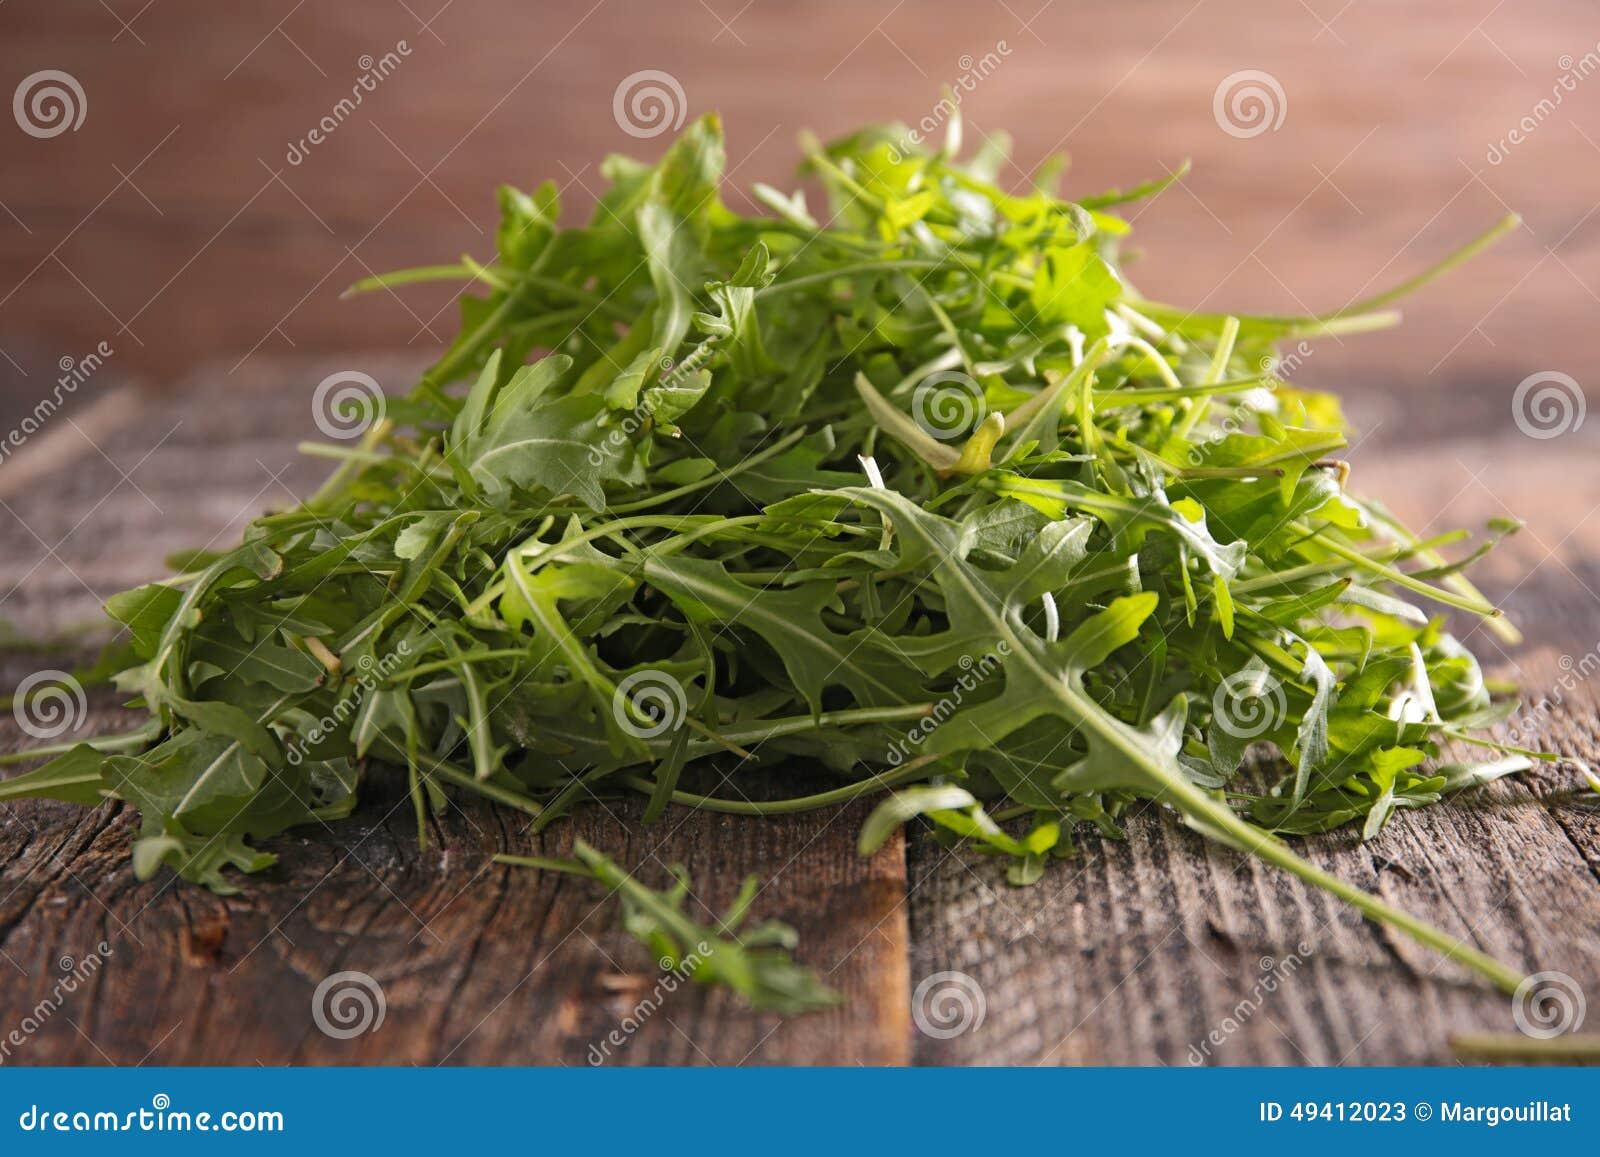 Download Arugula stockbild. Bild von salat, diät, kopfsalat, abendessen - 49412023